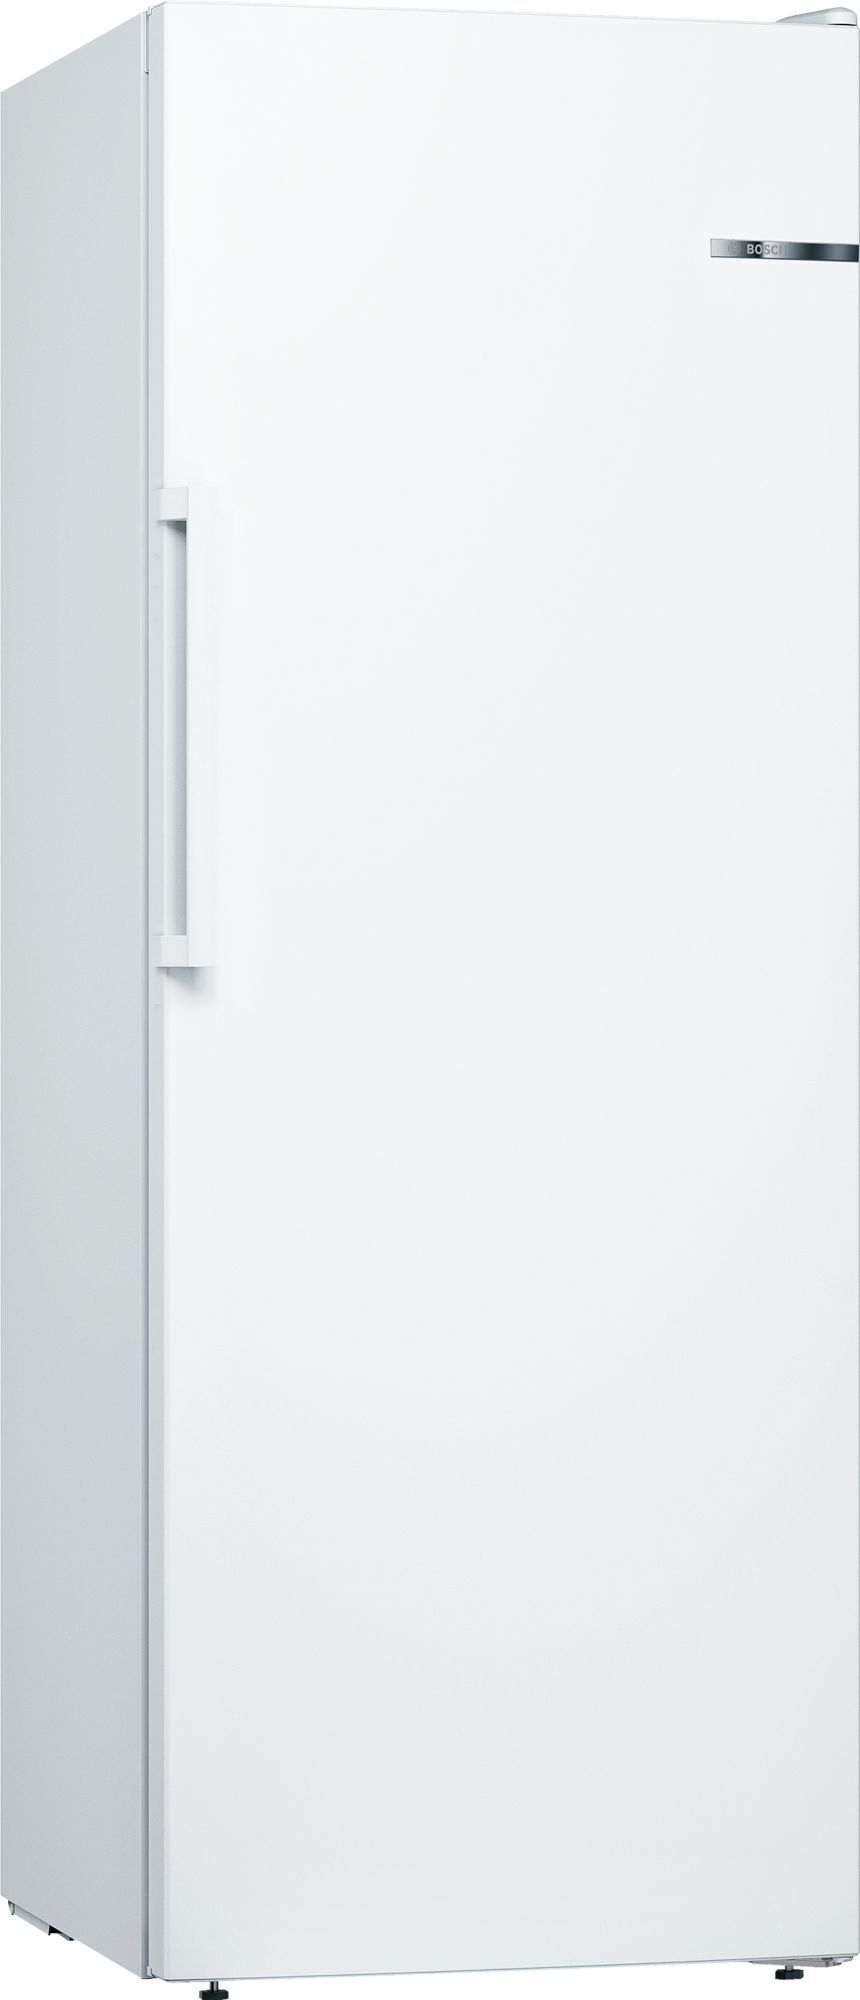 Bosch Serie 4 GSN29VW3VG Frost Free Tall Freezer